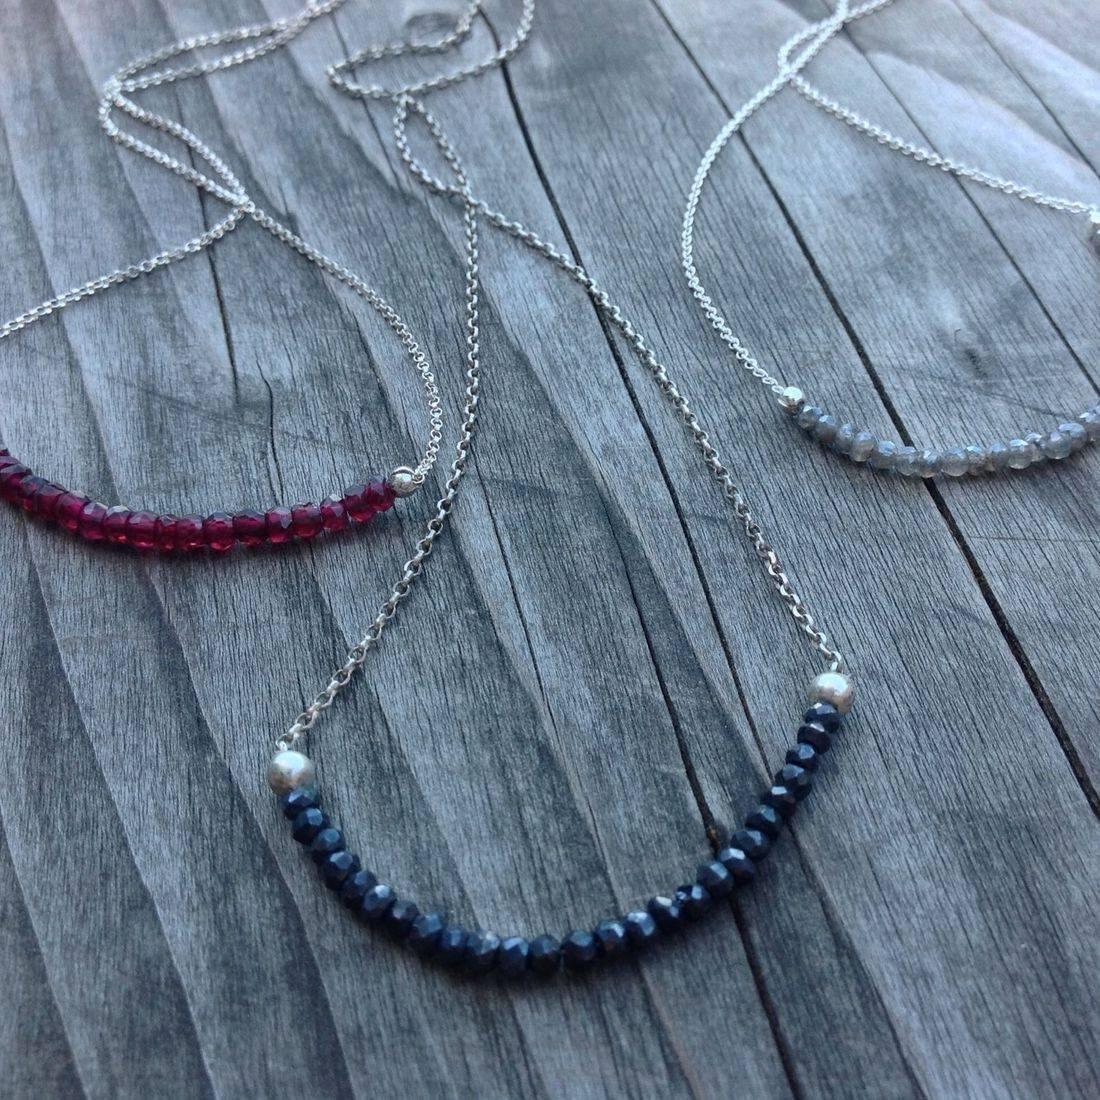 spinel, garnet, labradorite, faceted  gebmstone eads on silver chain, gemstone necklace, hand made gemstone necklace,  gemstone jewelry